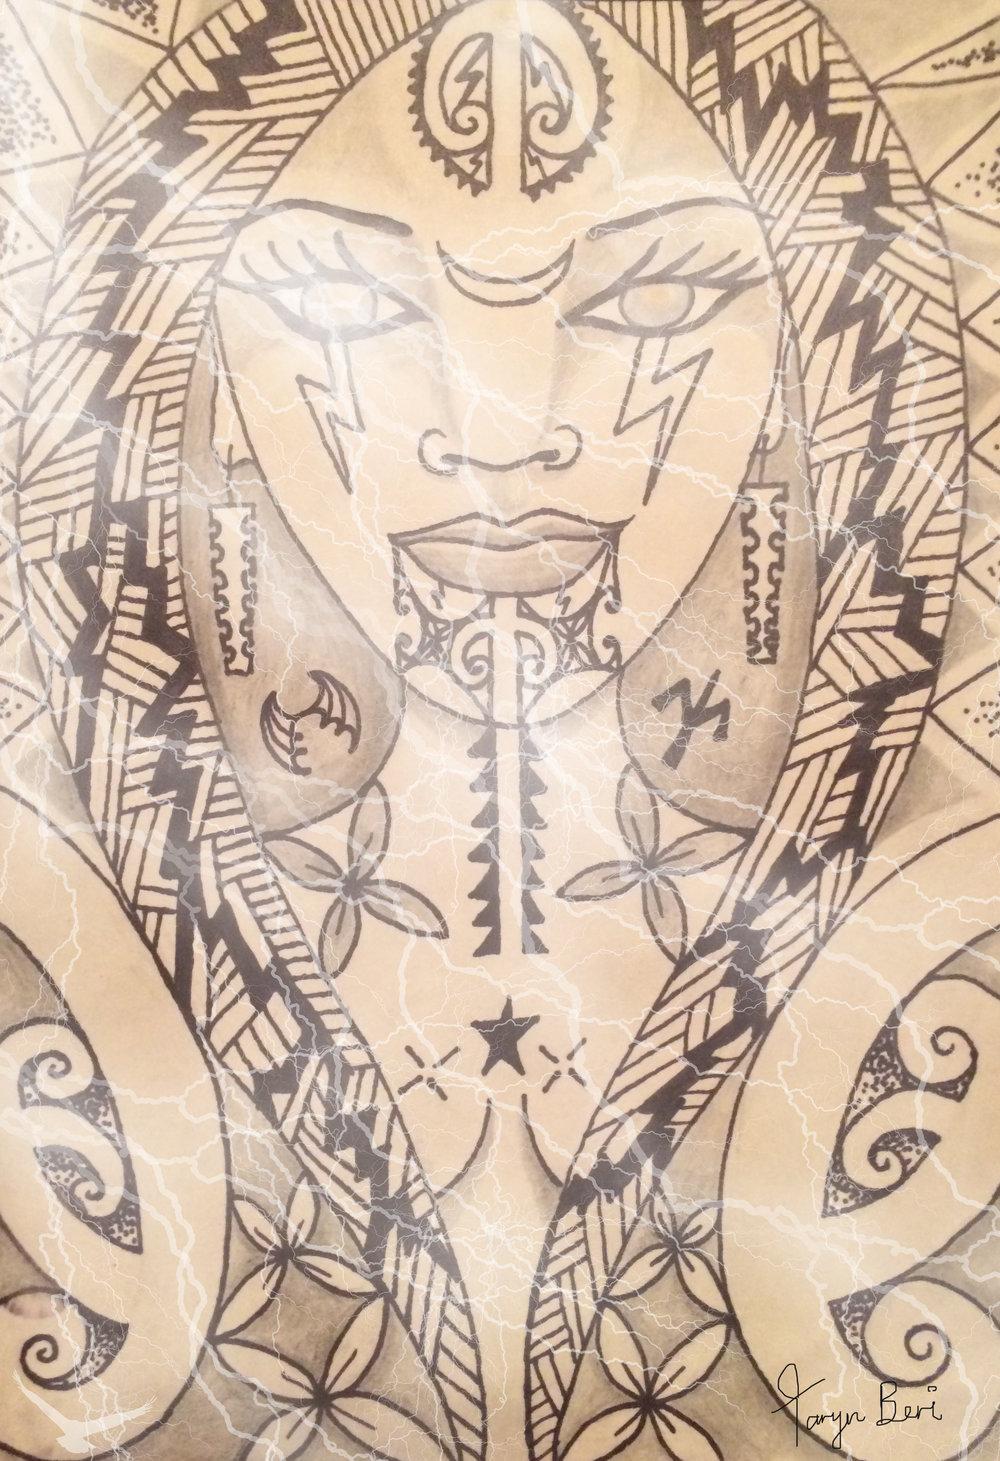 'Te Uira' by Taryn Beri.